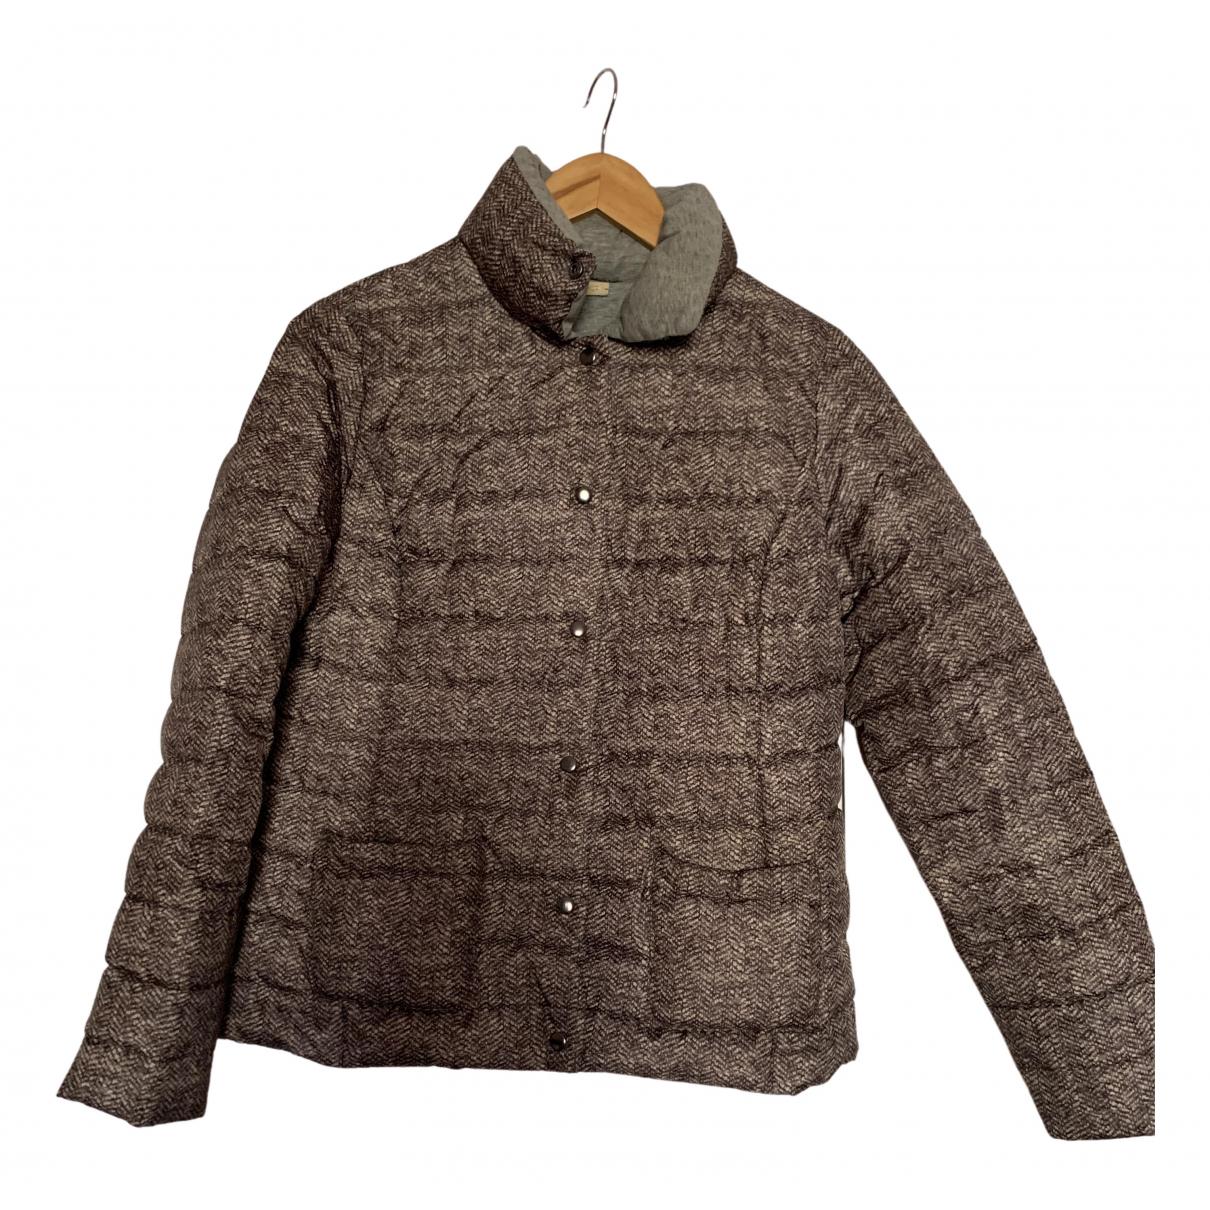 Falconeri \N Lederjacke in  Braun Polyester